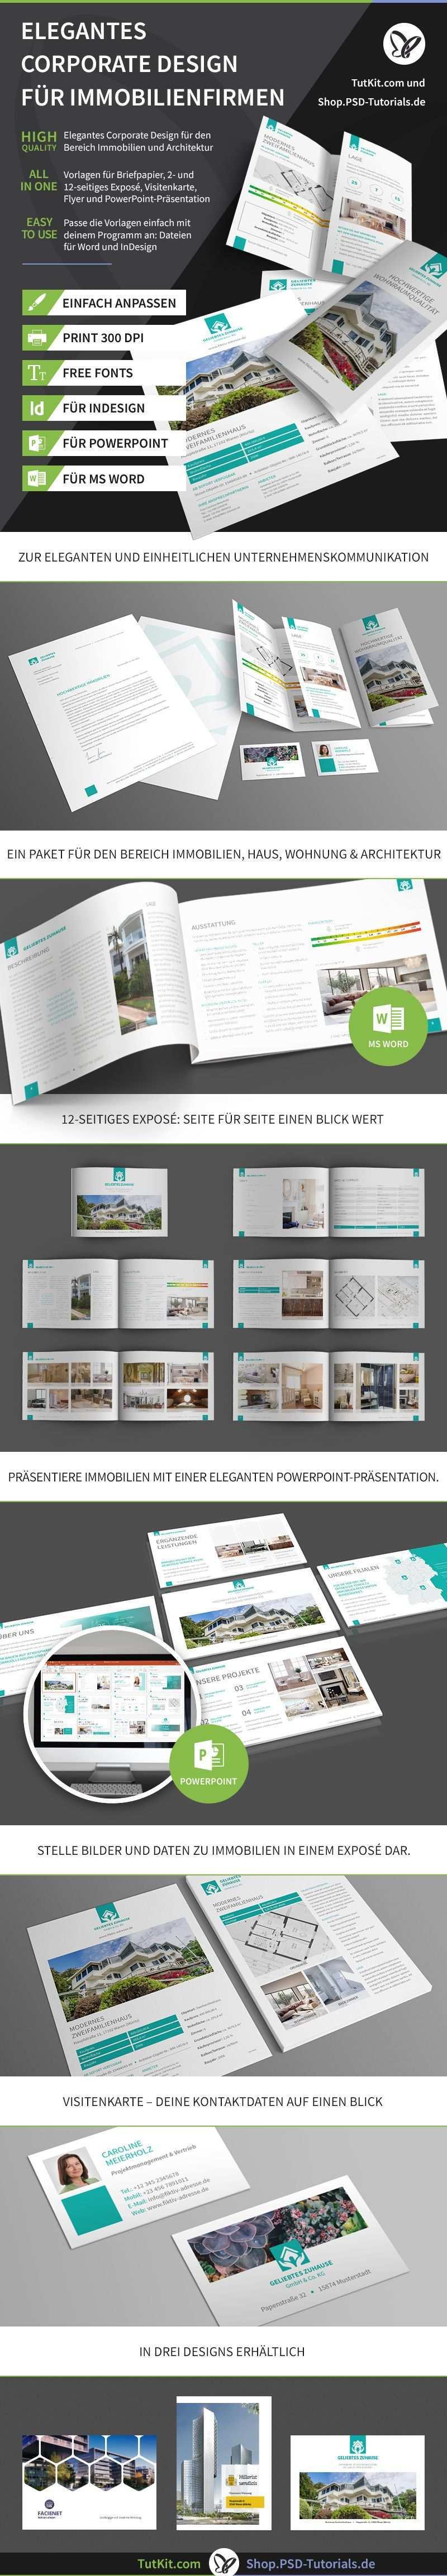 Elegantes Corporate Design Fur Immobilienfirmen Und Architekturburos Expose Immobilien Visitenkarten Corporate Design